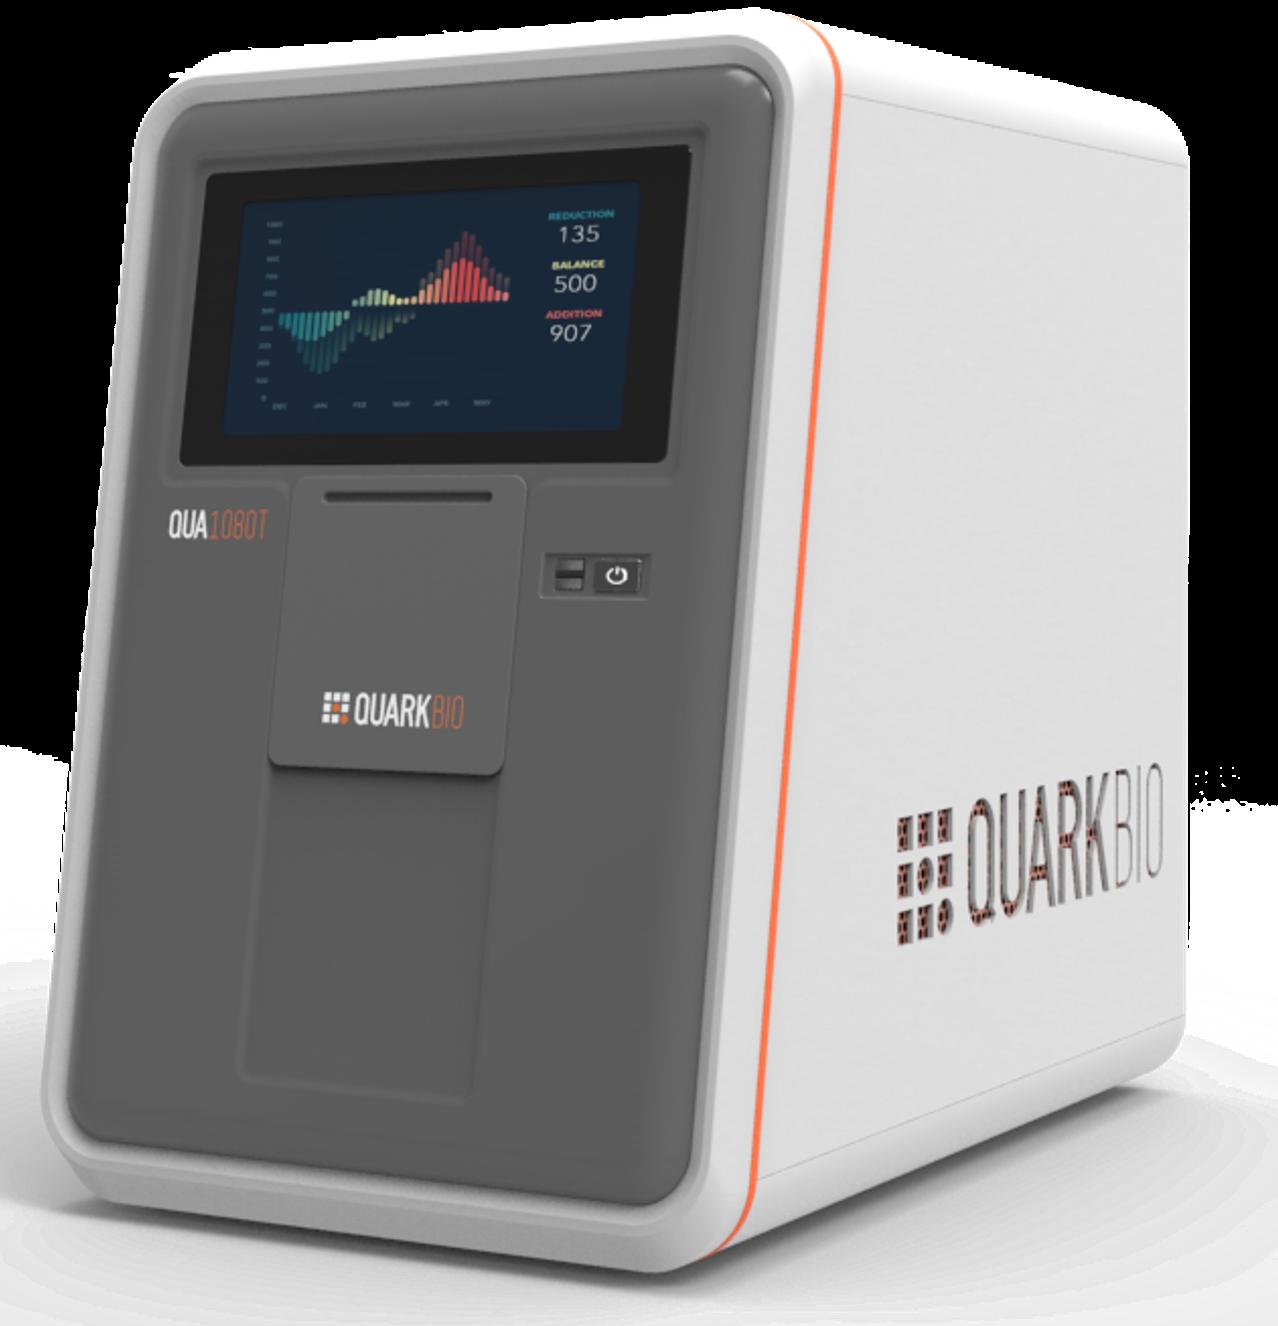 QuarkBio-Panel Chi p® Anal ysi s Syst em